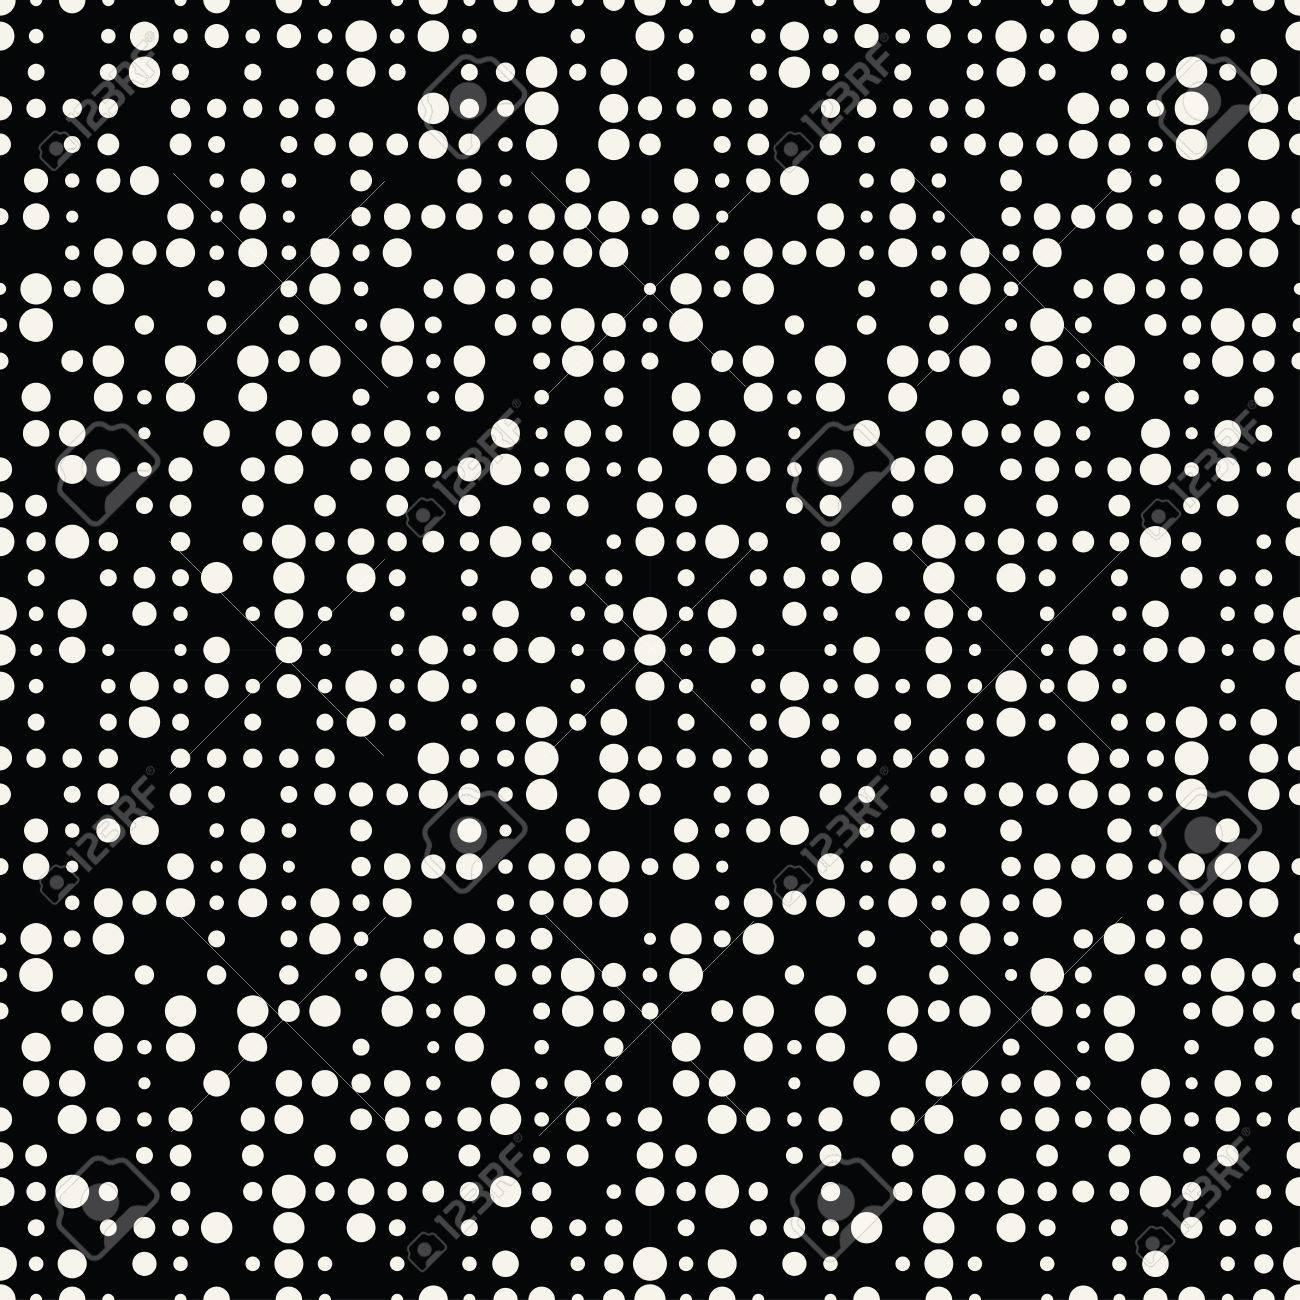 Geometric dots deco art seamless pattern design. - 83947046